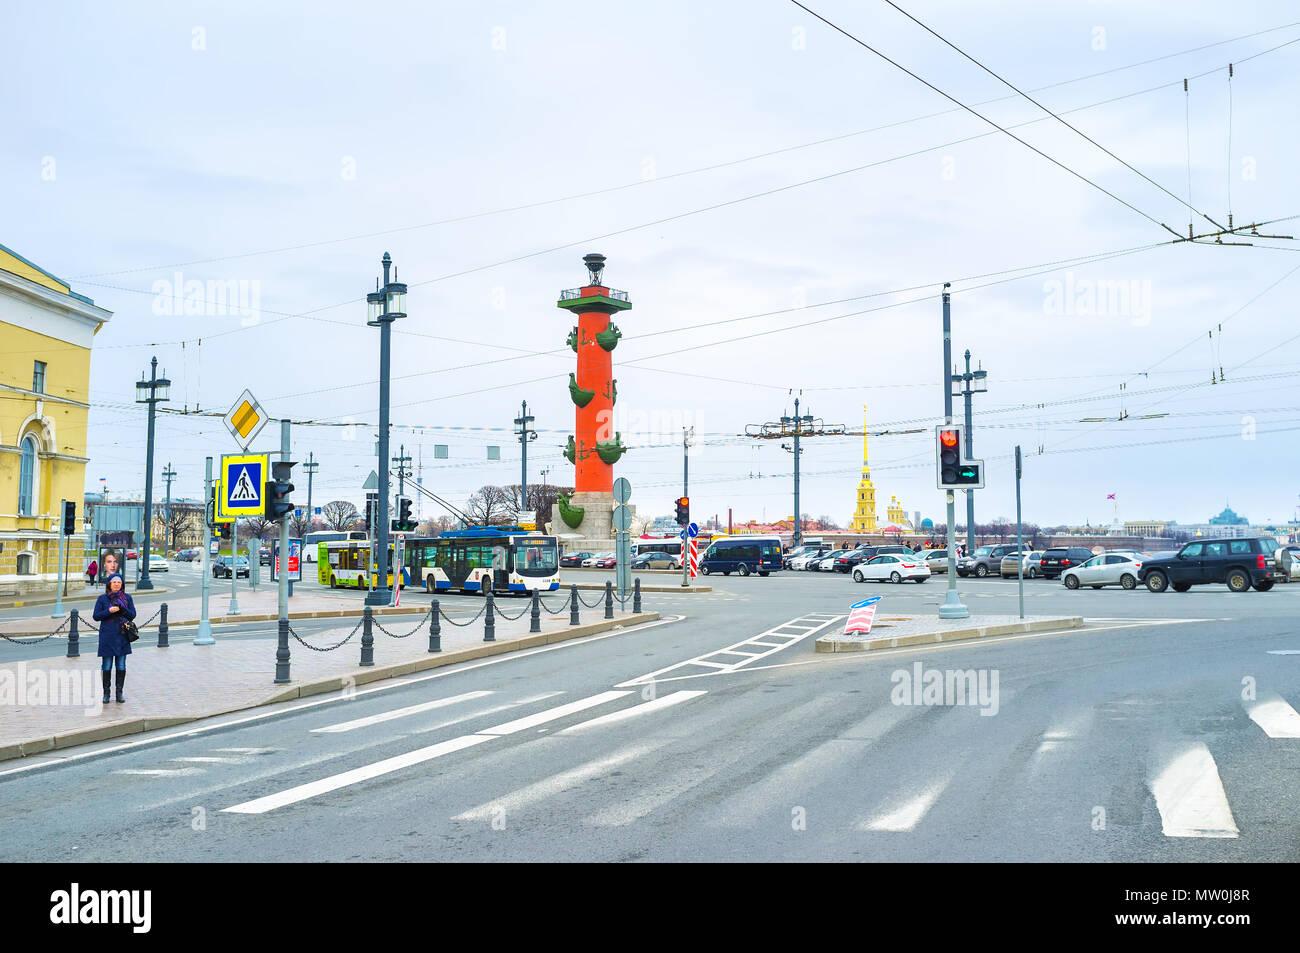 SAINT PETERSBURG, RUSSIA - APRIL 26, 2015: The urban scene of the crossroad on Vasilyevsky island, on April 26 in S. Petersburg Stock Photo